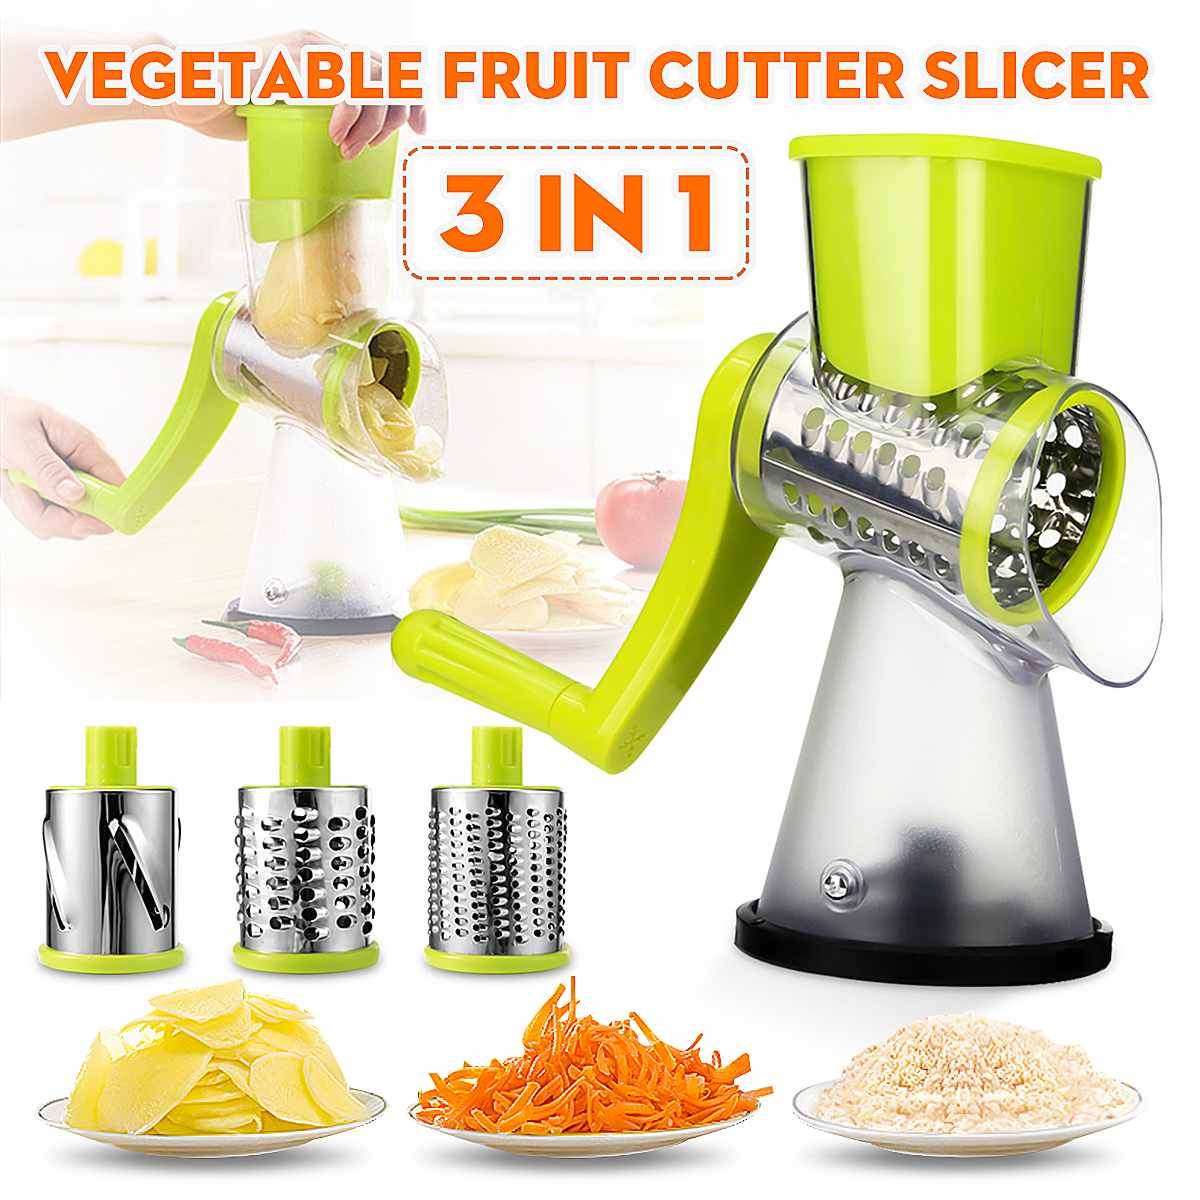 Rolo manual cortador de cortador de legumes cortador de batata chopper cenoura ralador destacável 3 lâmina de aço inoxidável antiderrapante base moedor de carne